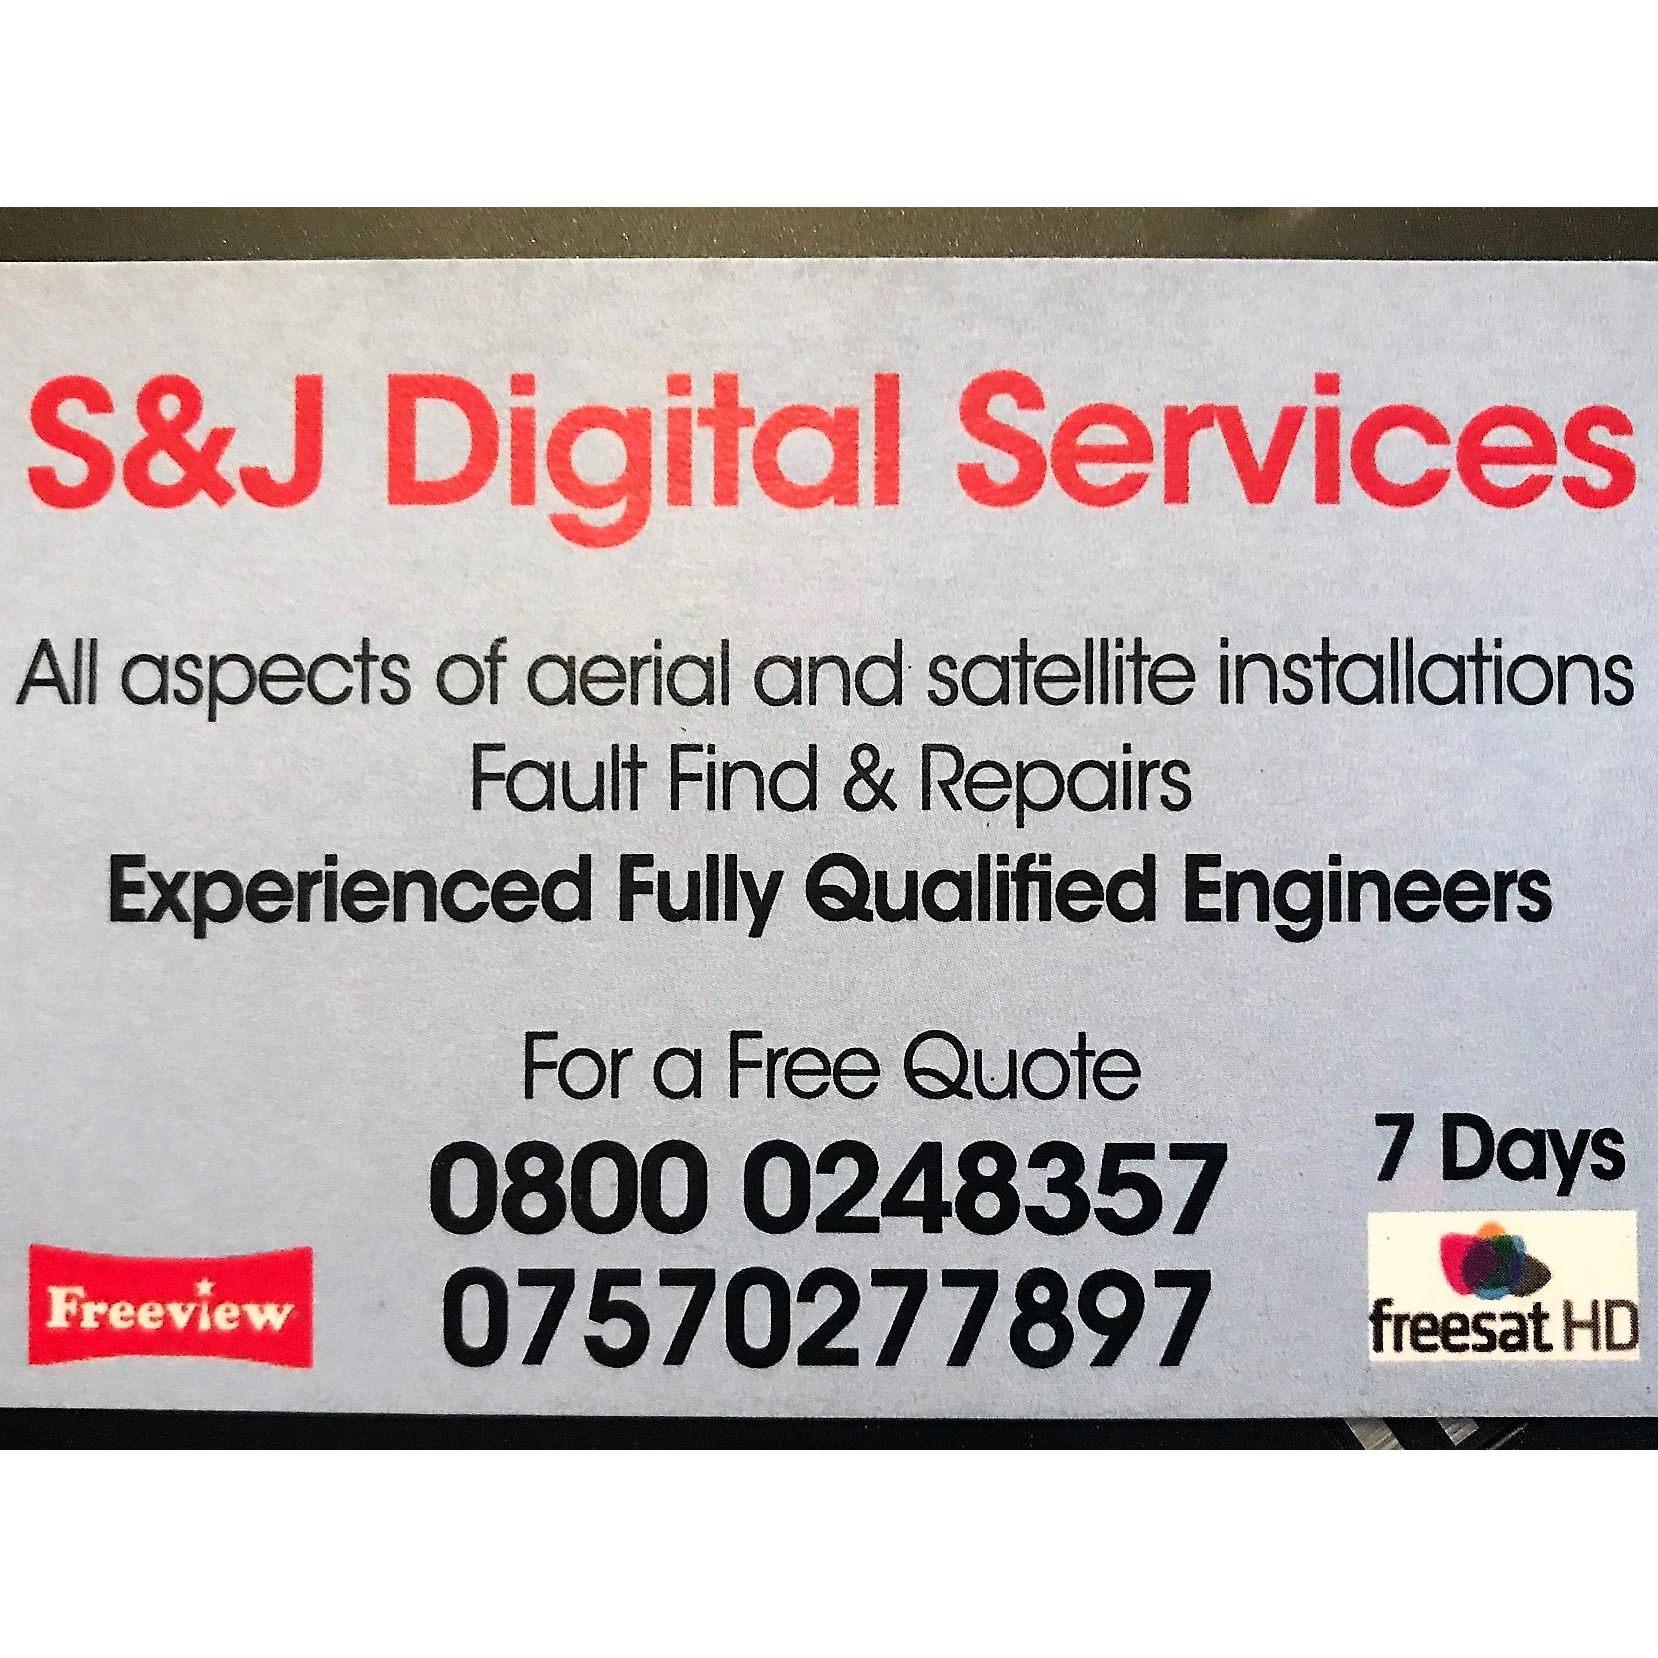 S & J Digital Services